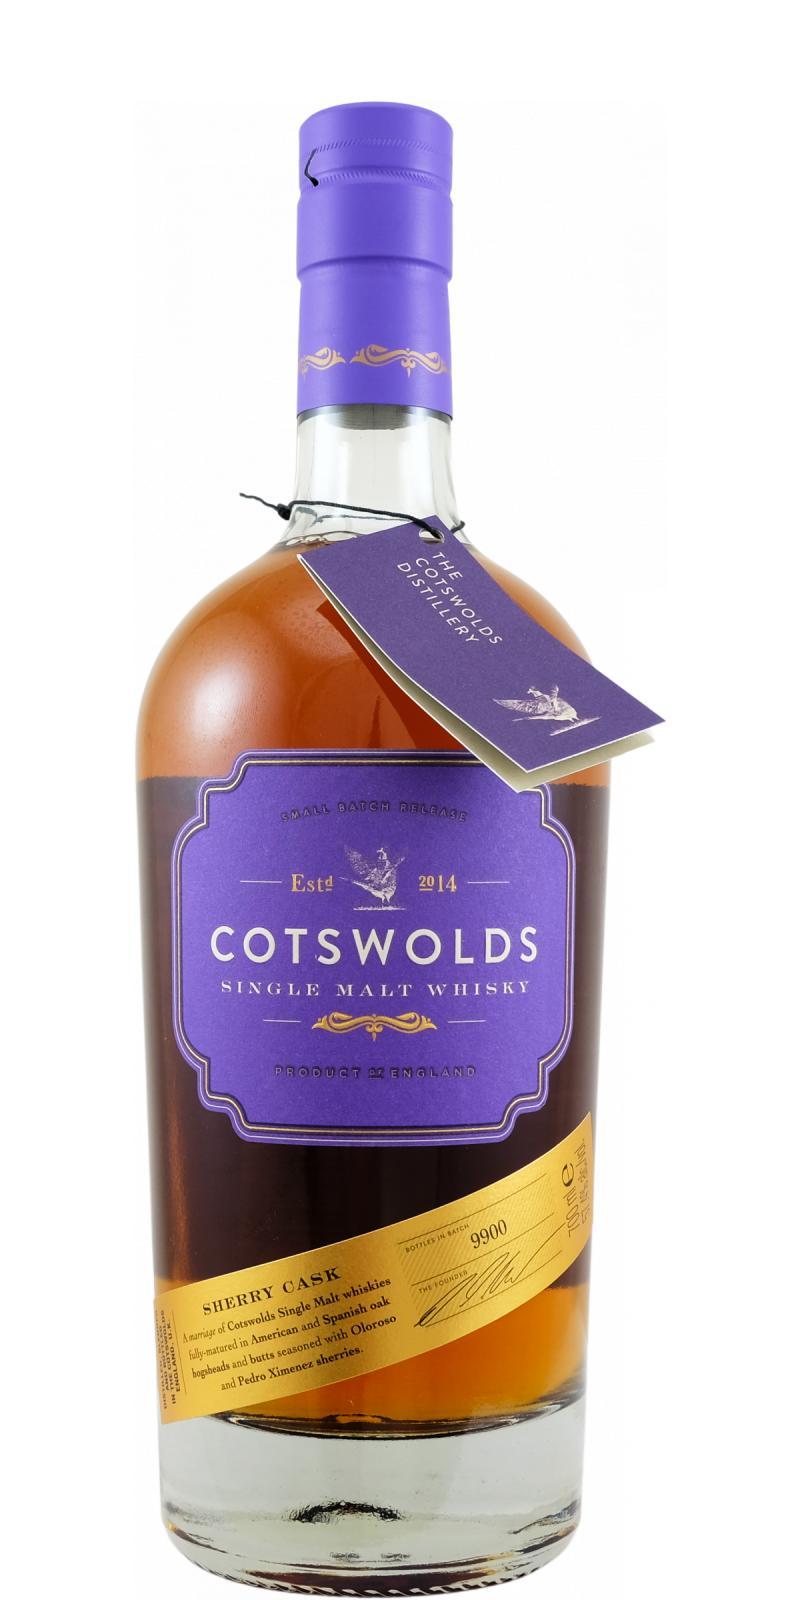 Cotswolds Distillery Sherry Cask